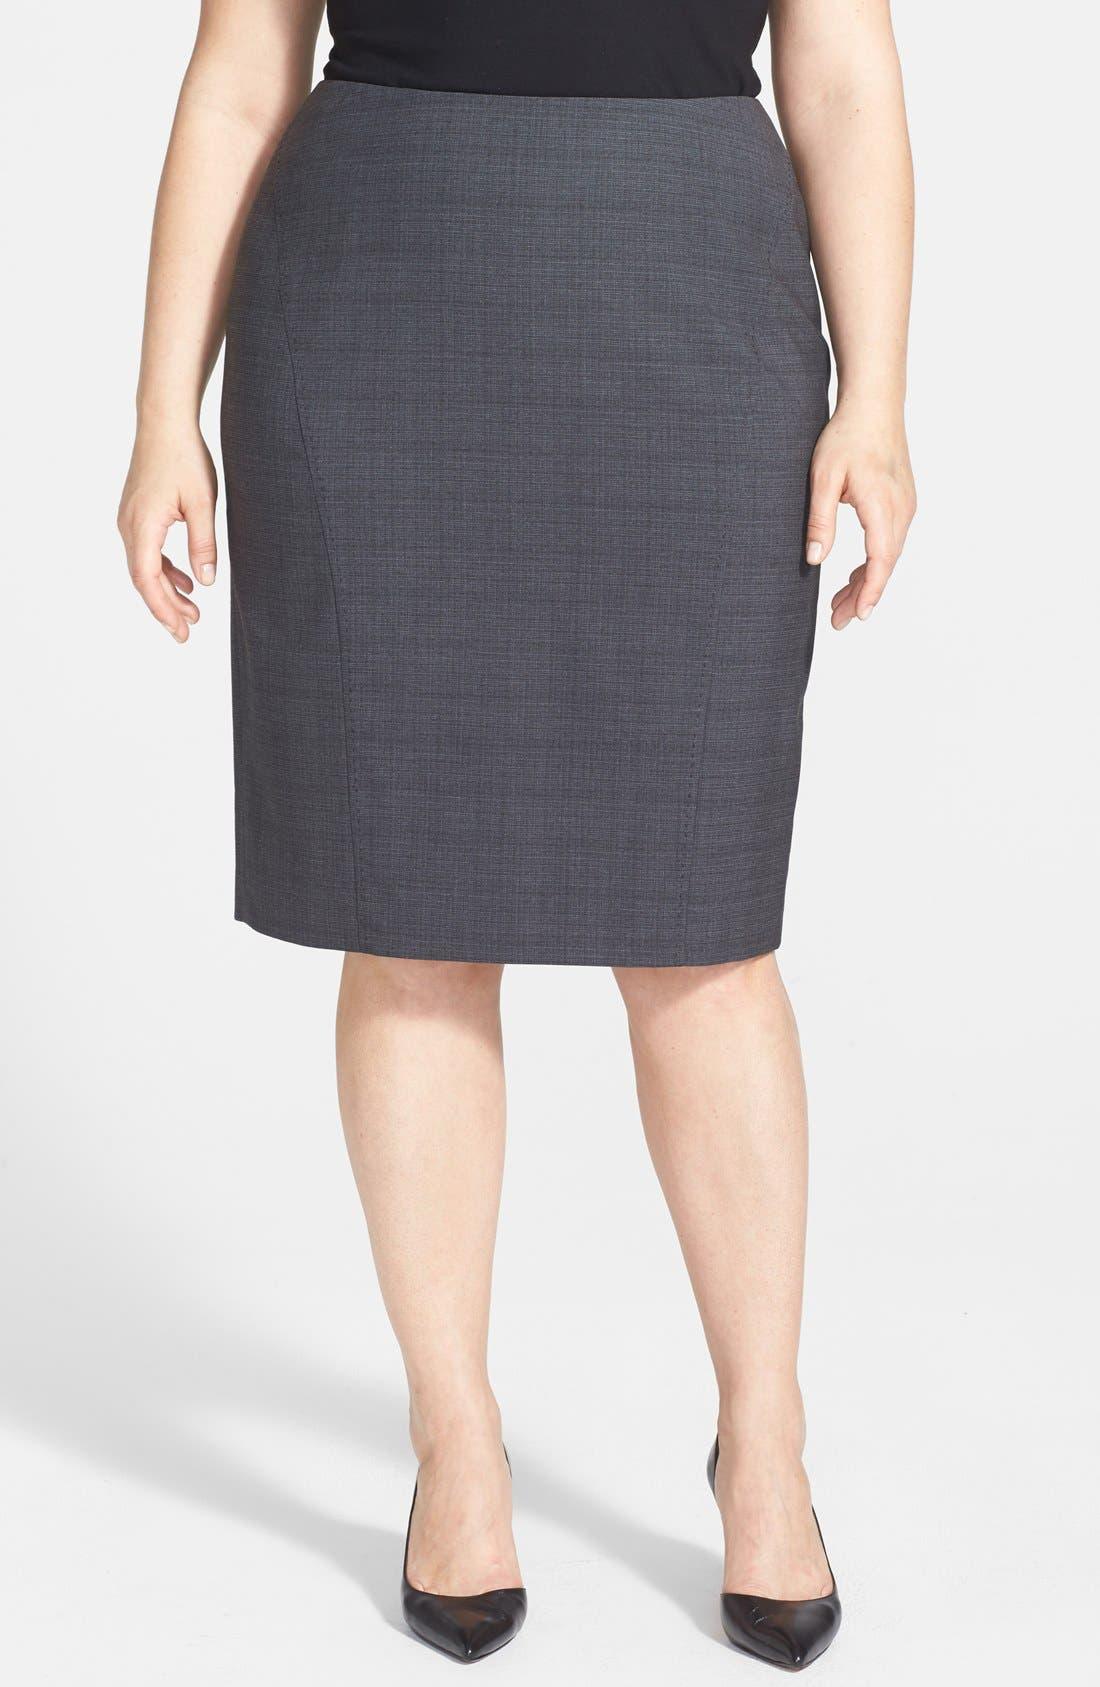 Alternate Image 1 Selected - Sejour 'Charcoal Crosshatch' Suit Skirt (Plus Size)